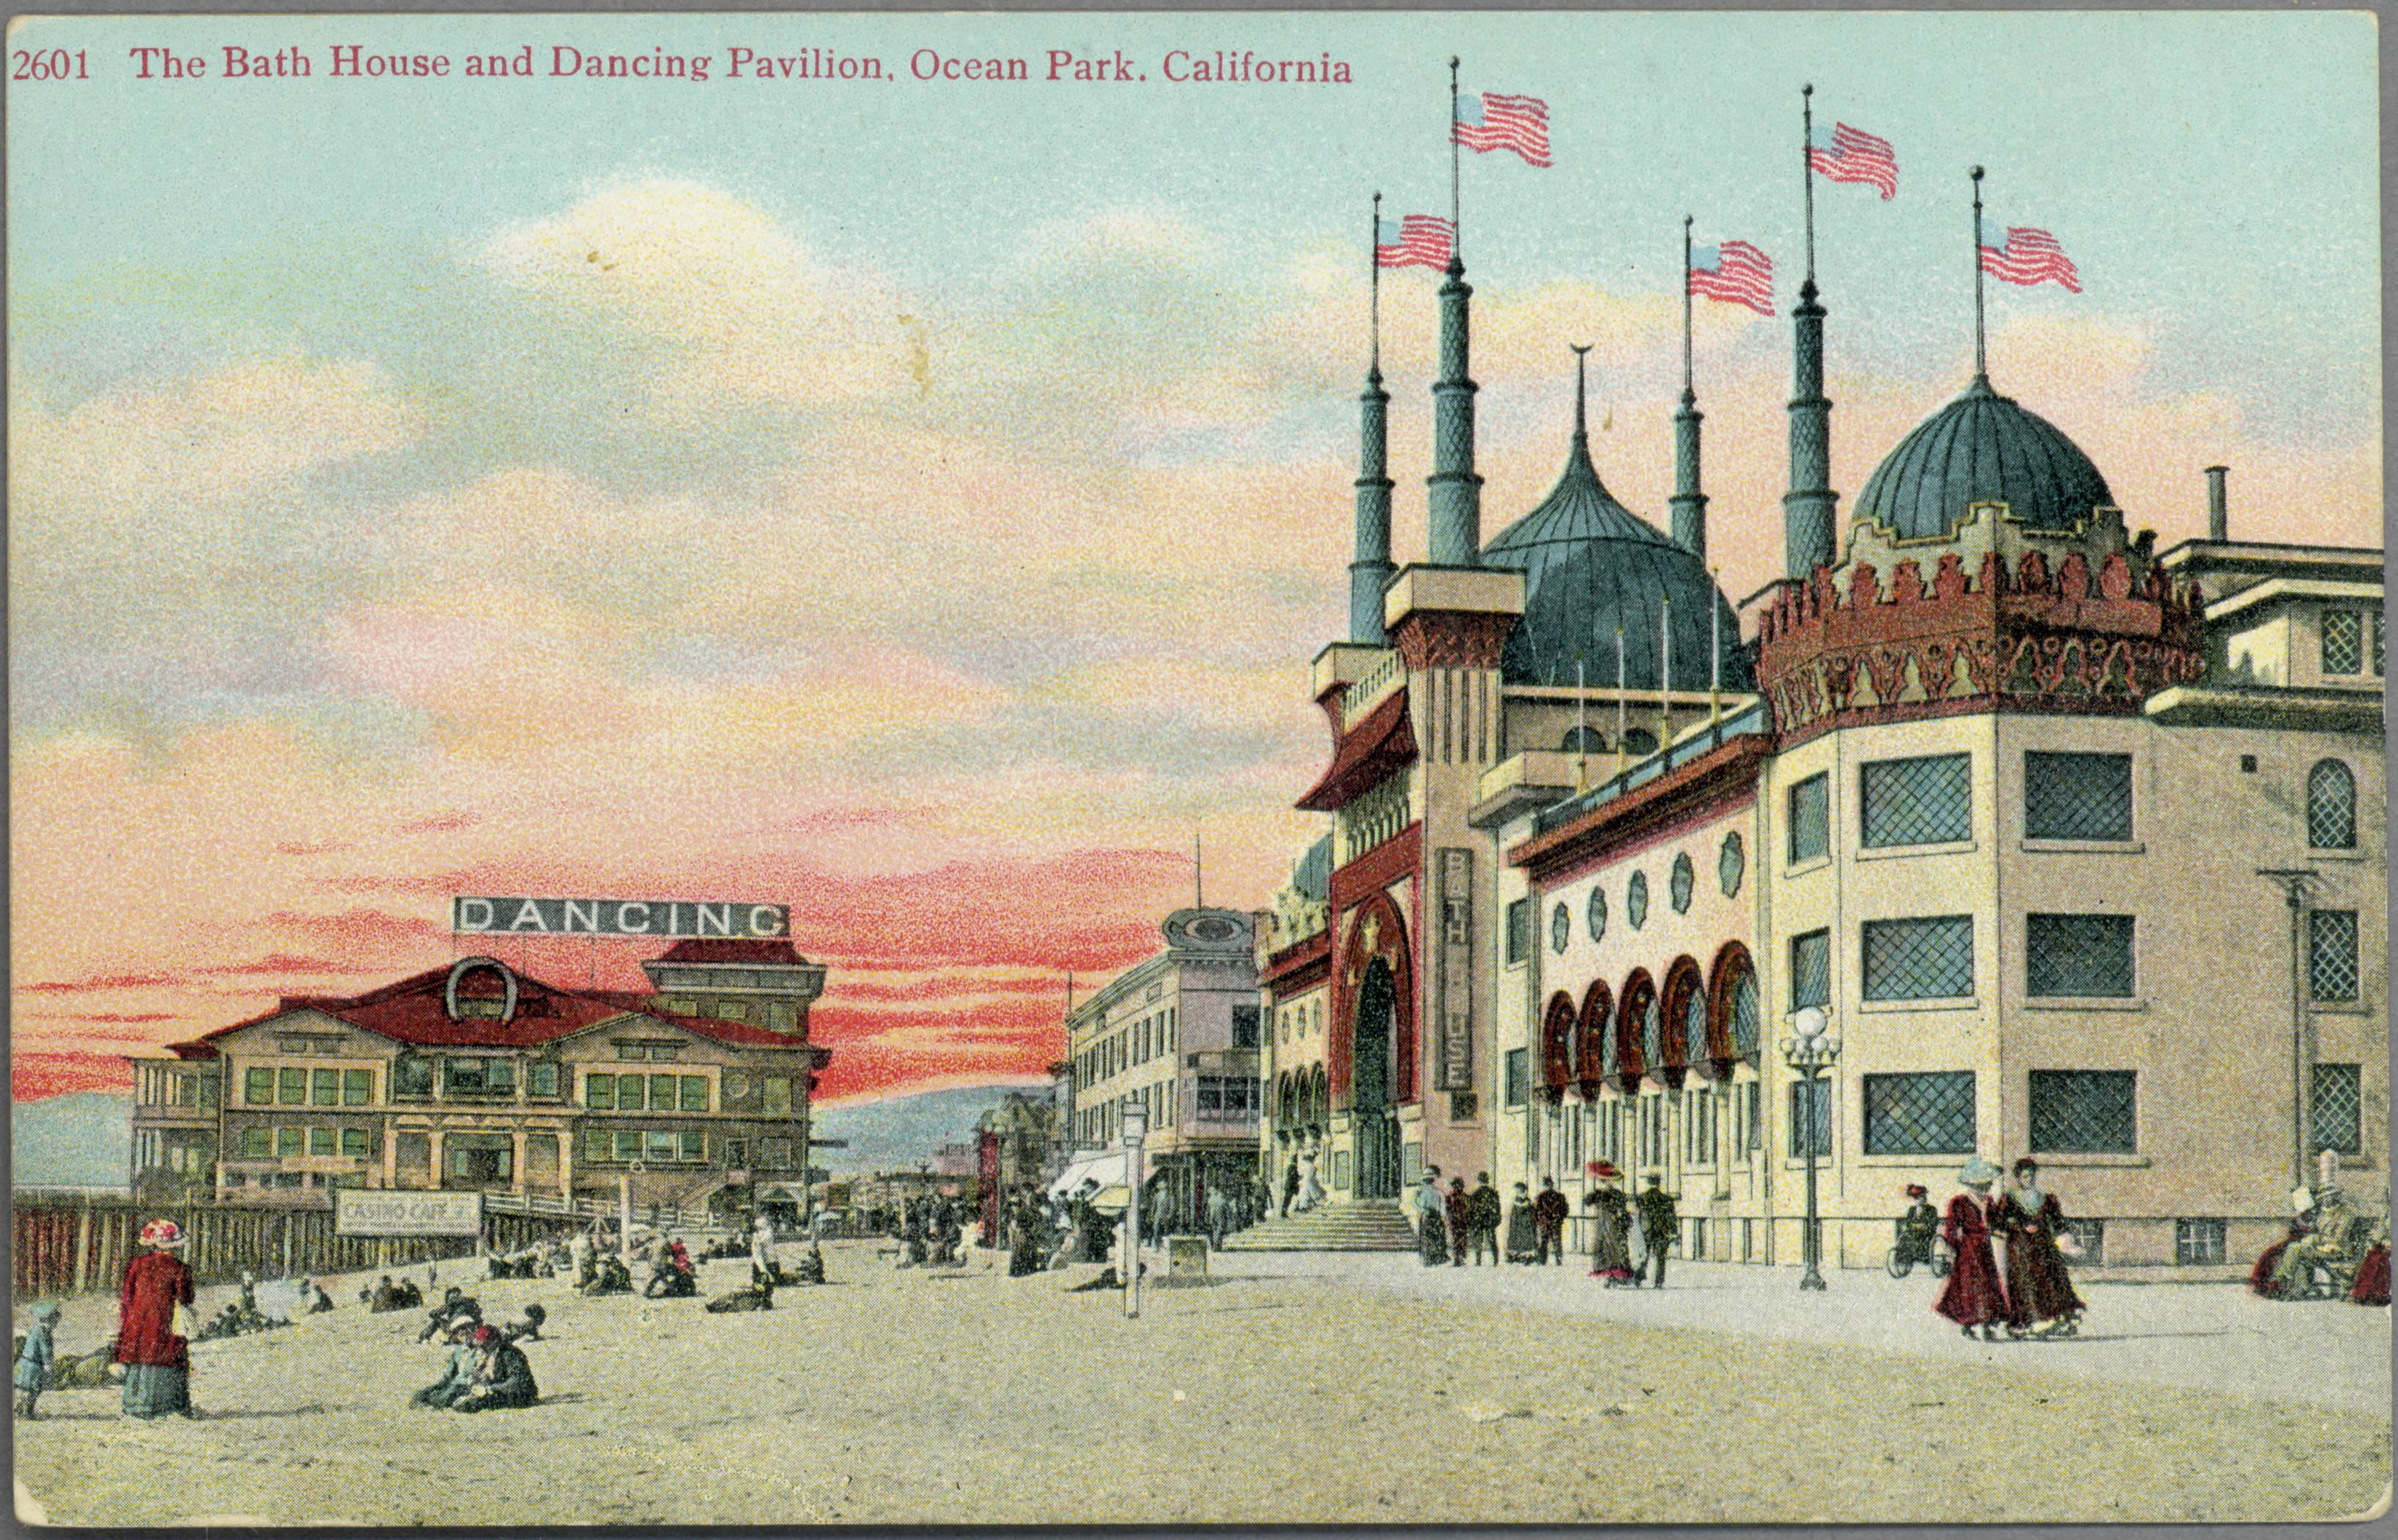 file the bath house and dancing pavilion ocean park california